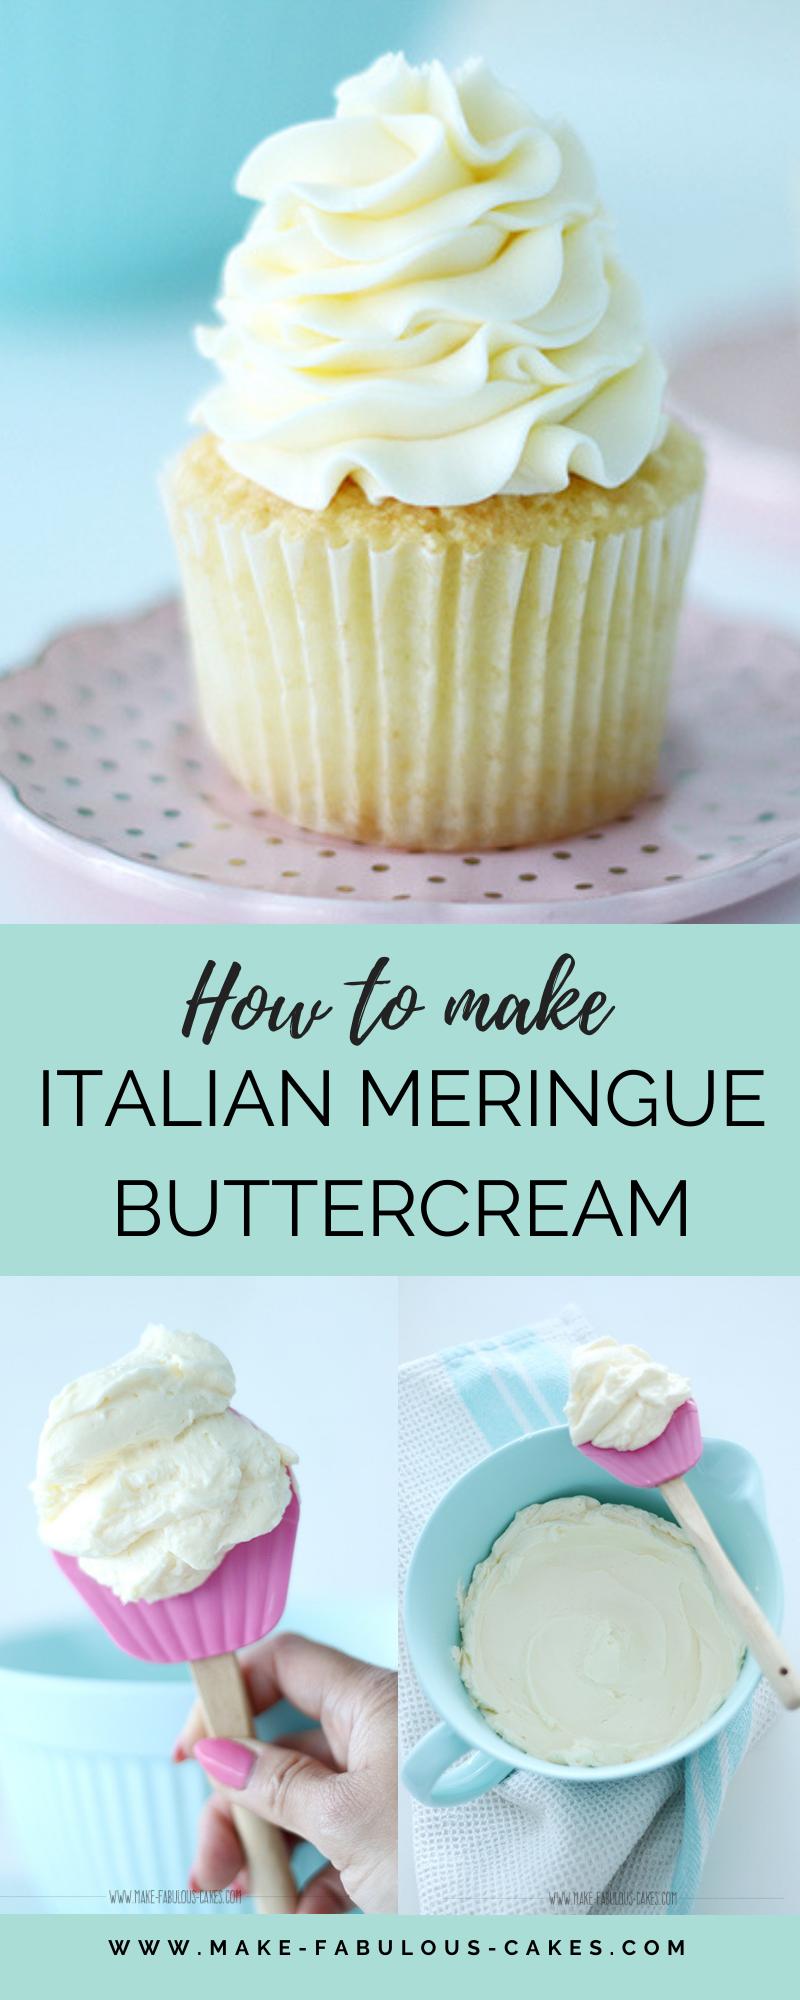 How to make Italian Meringue Buttercream